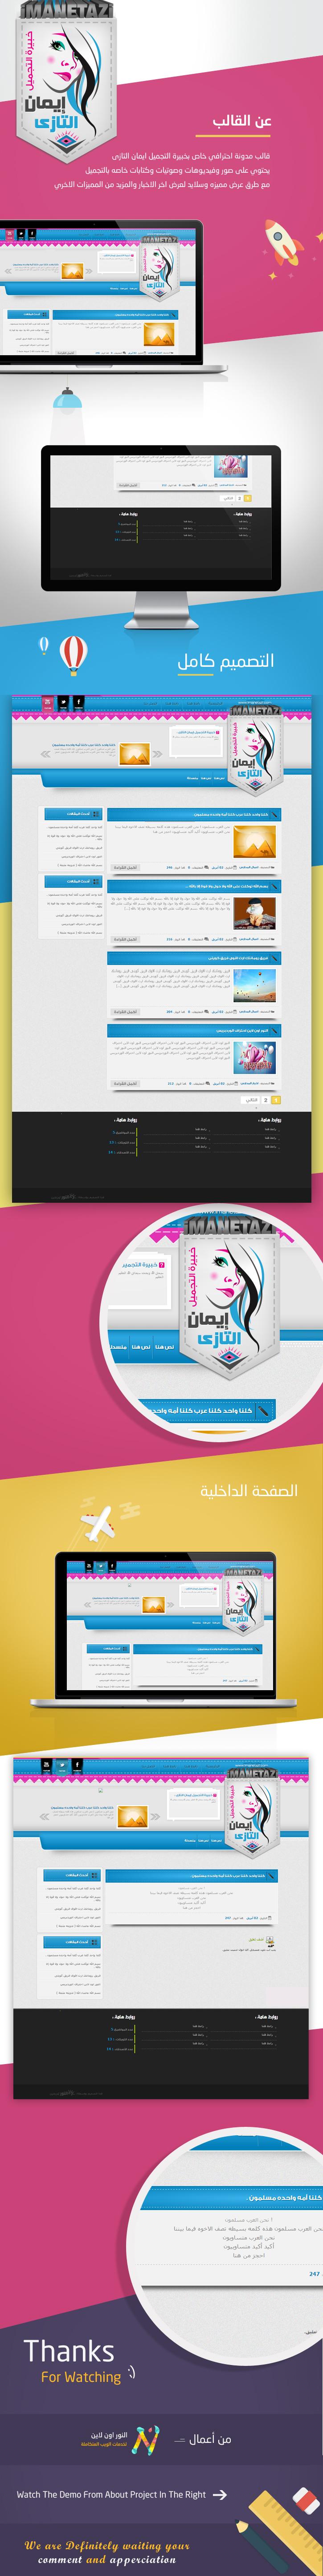 Iman Tazi Wordpress Blog by ElNoorOnline